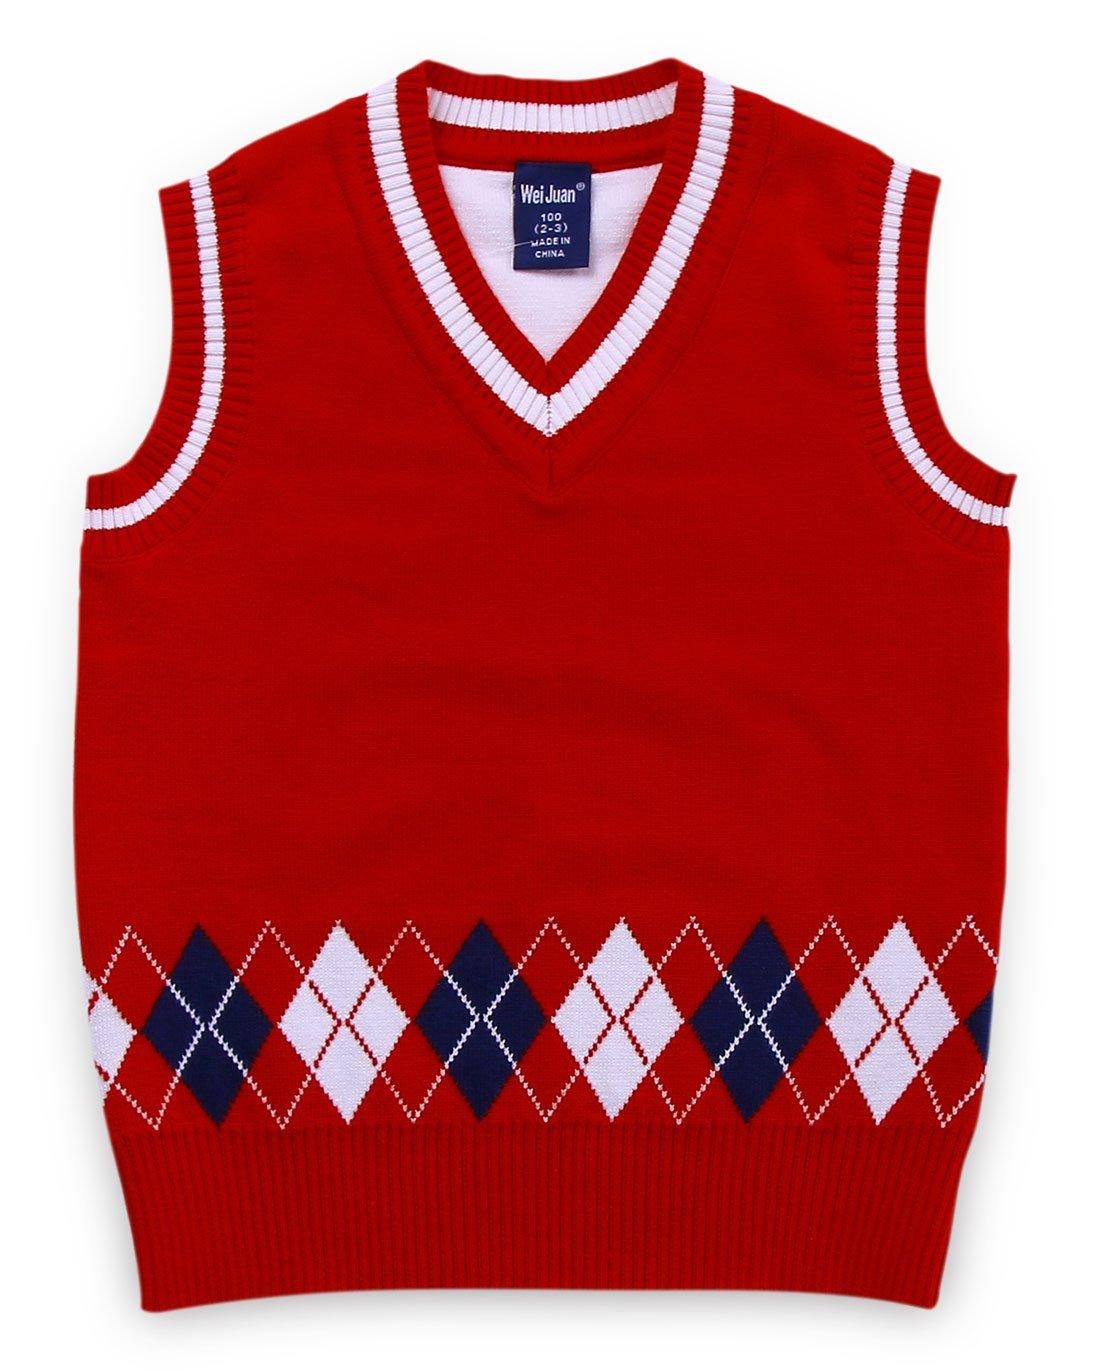 Boys Sweater Vest Argyle V Neck Sleeveless Pullover Knit School Waistcoat 2-7T Wei Juan